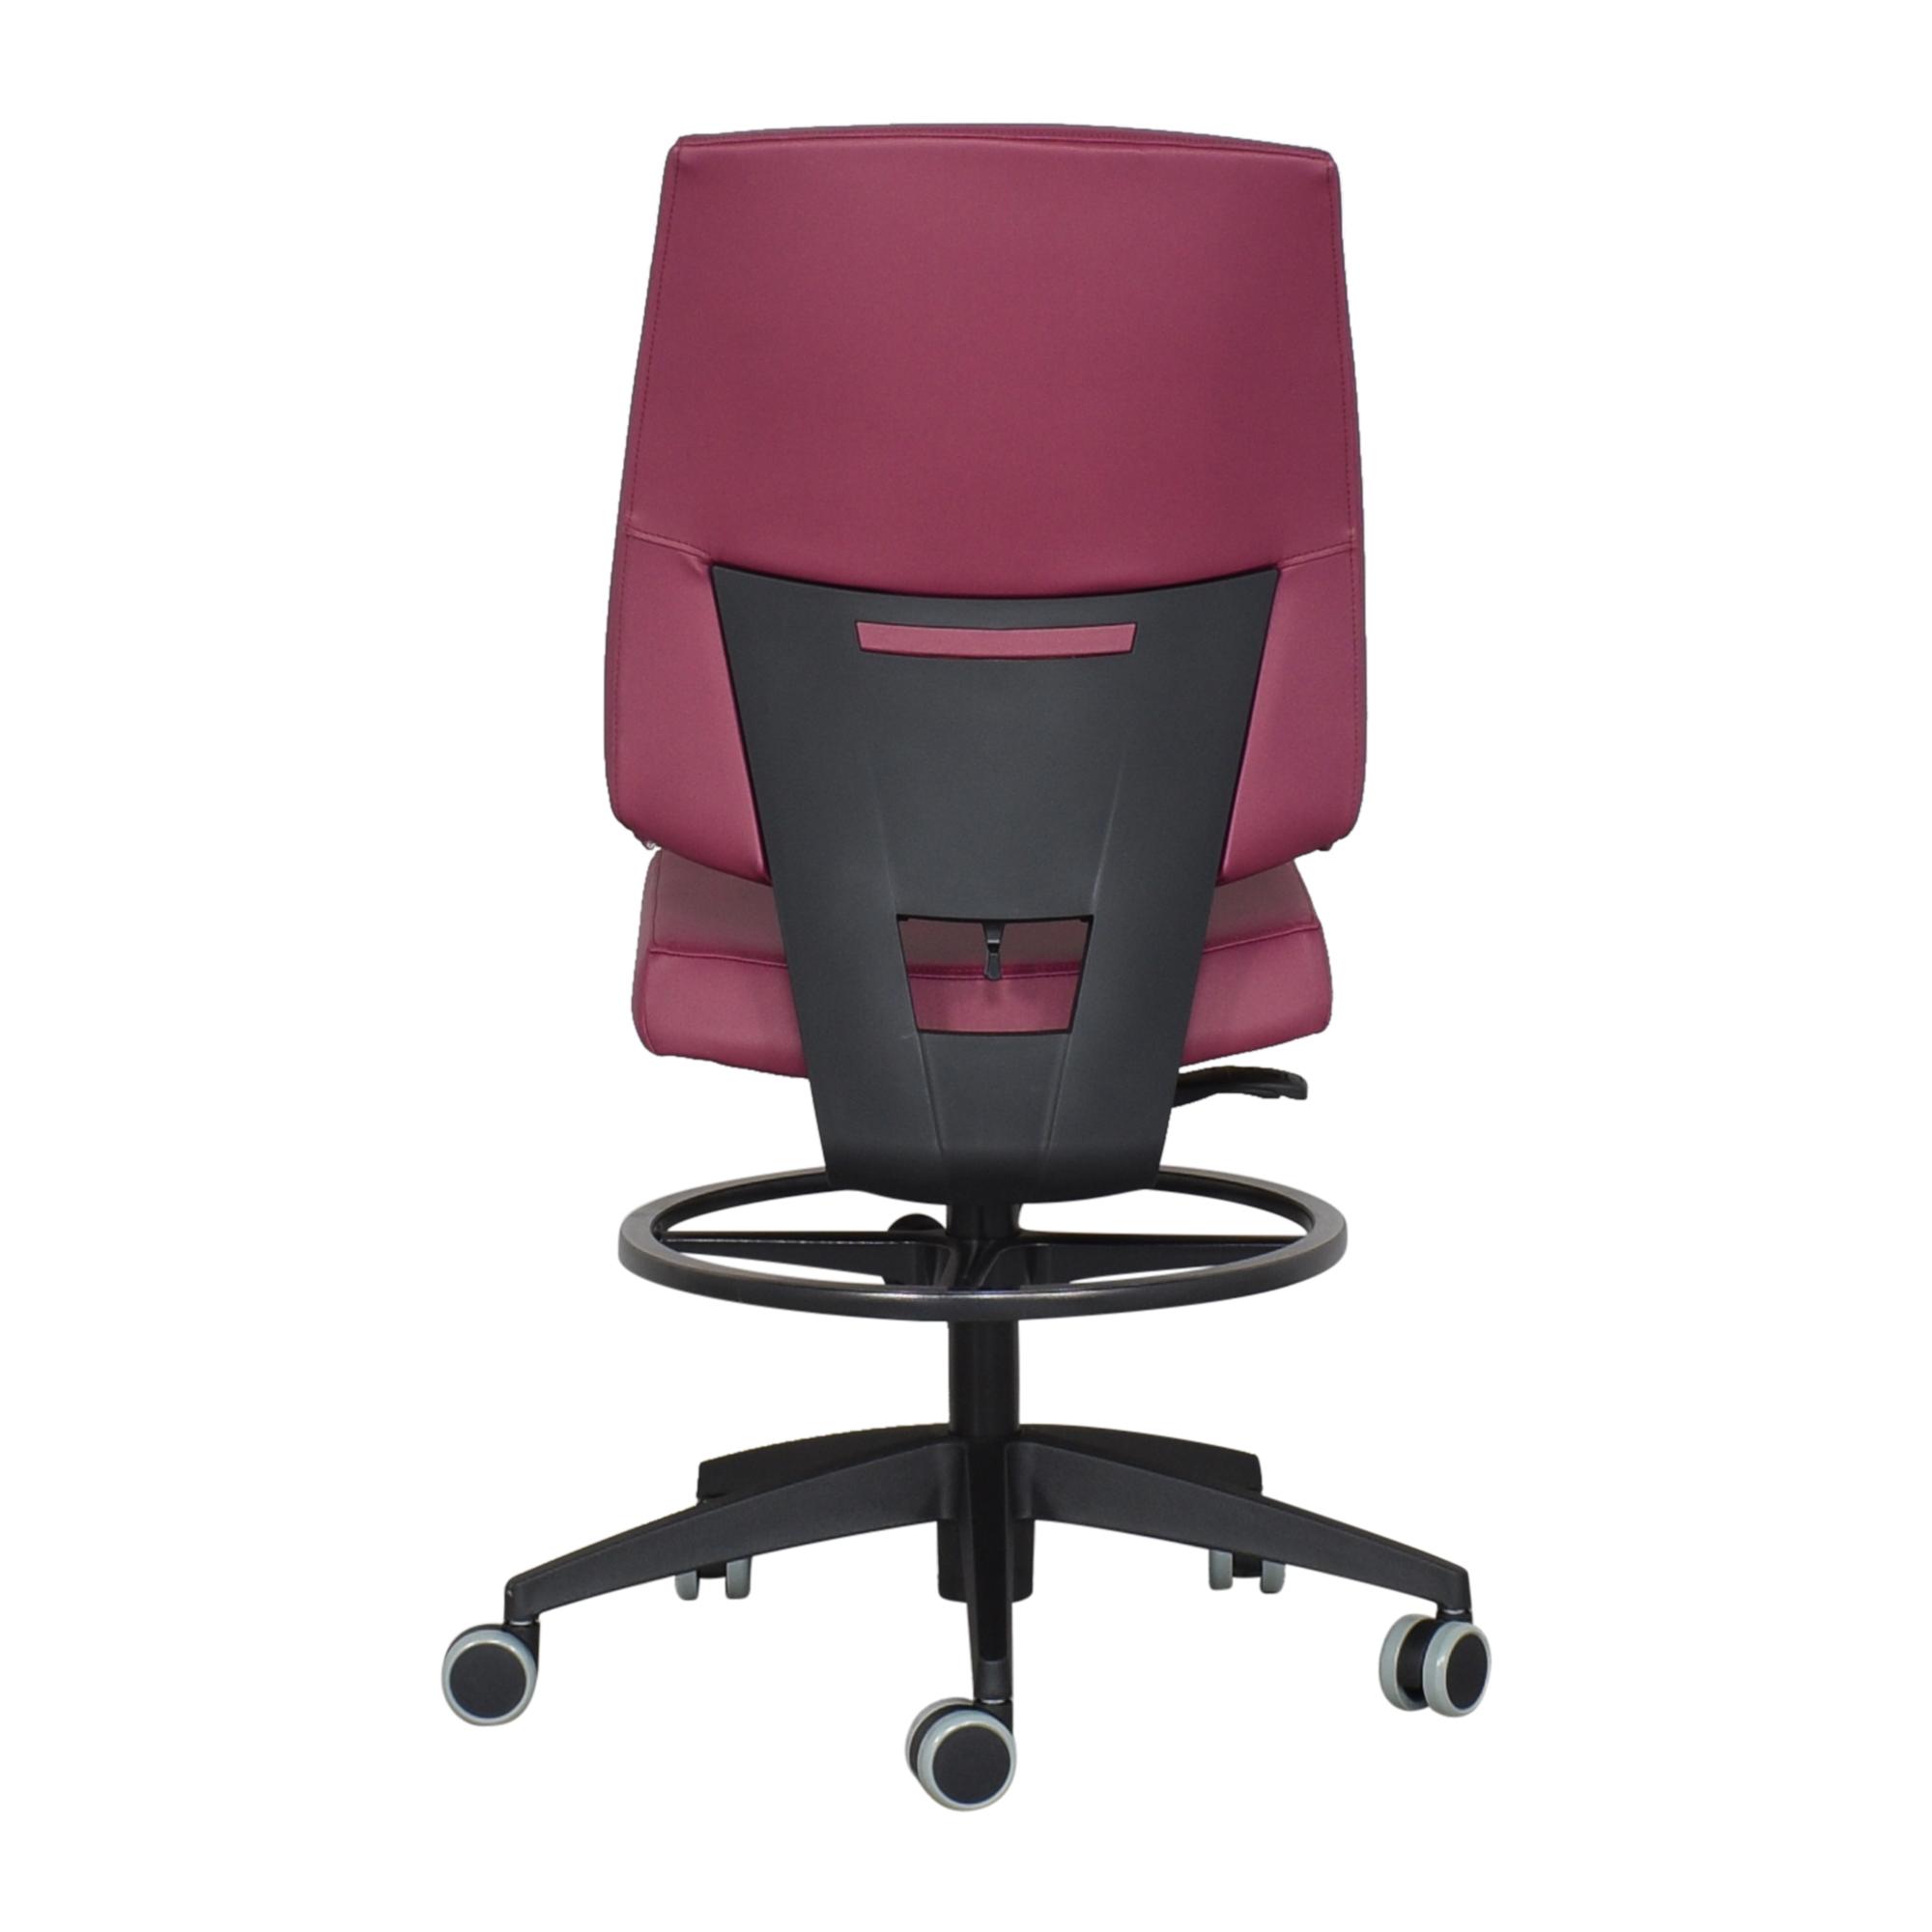 Global Furniture Group Global Furniture Group G1 Ergo Select Drafting Stool nyc